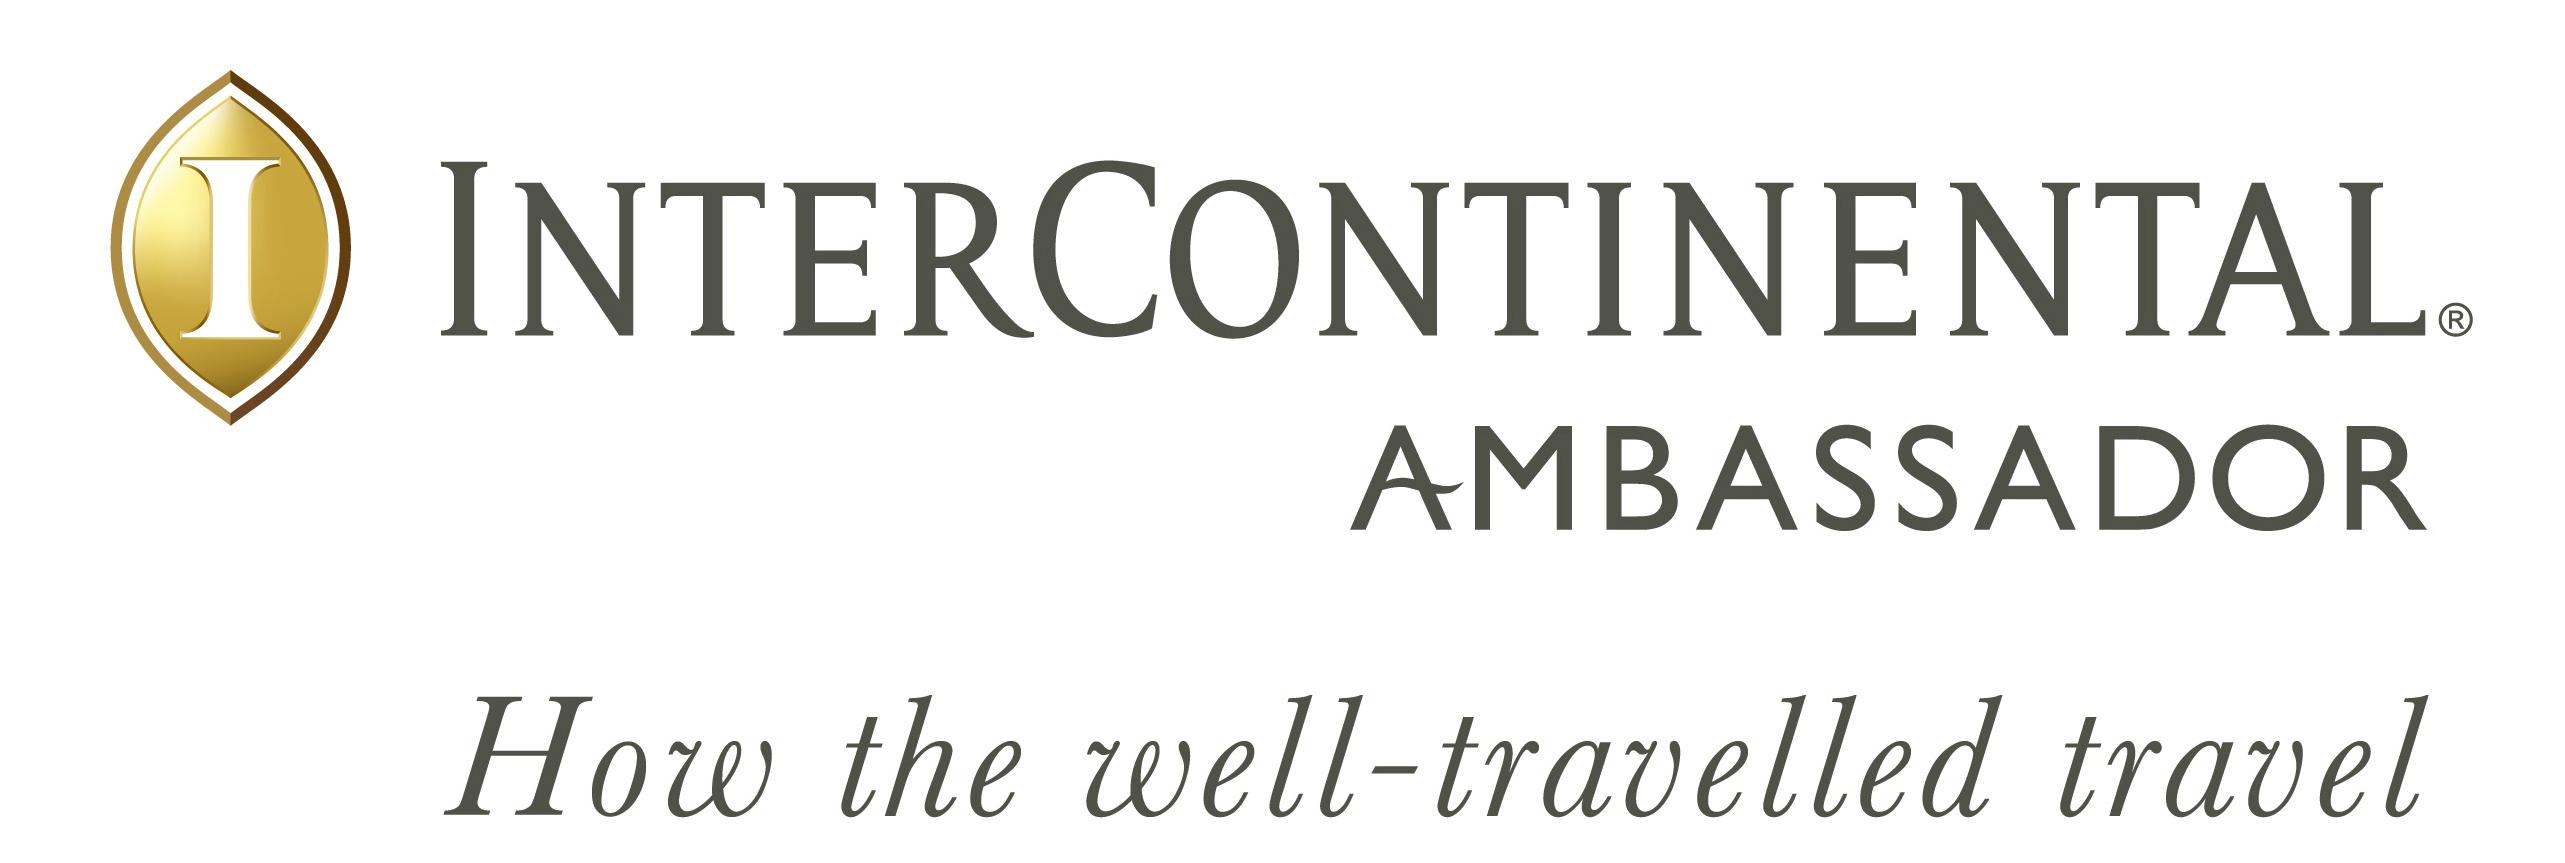 Is Intercontinental's Ambassador Programme Improving in 2019